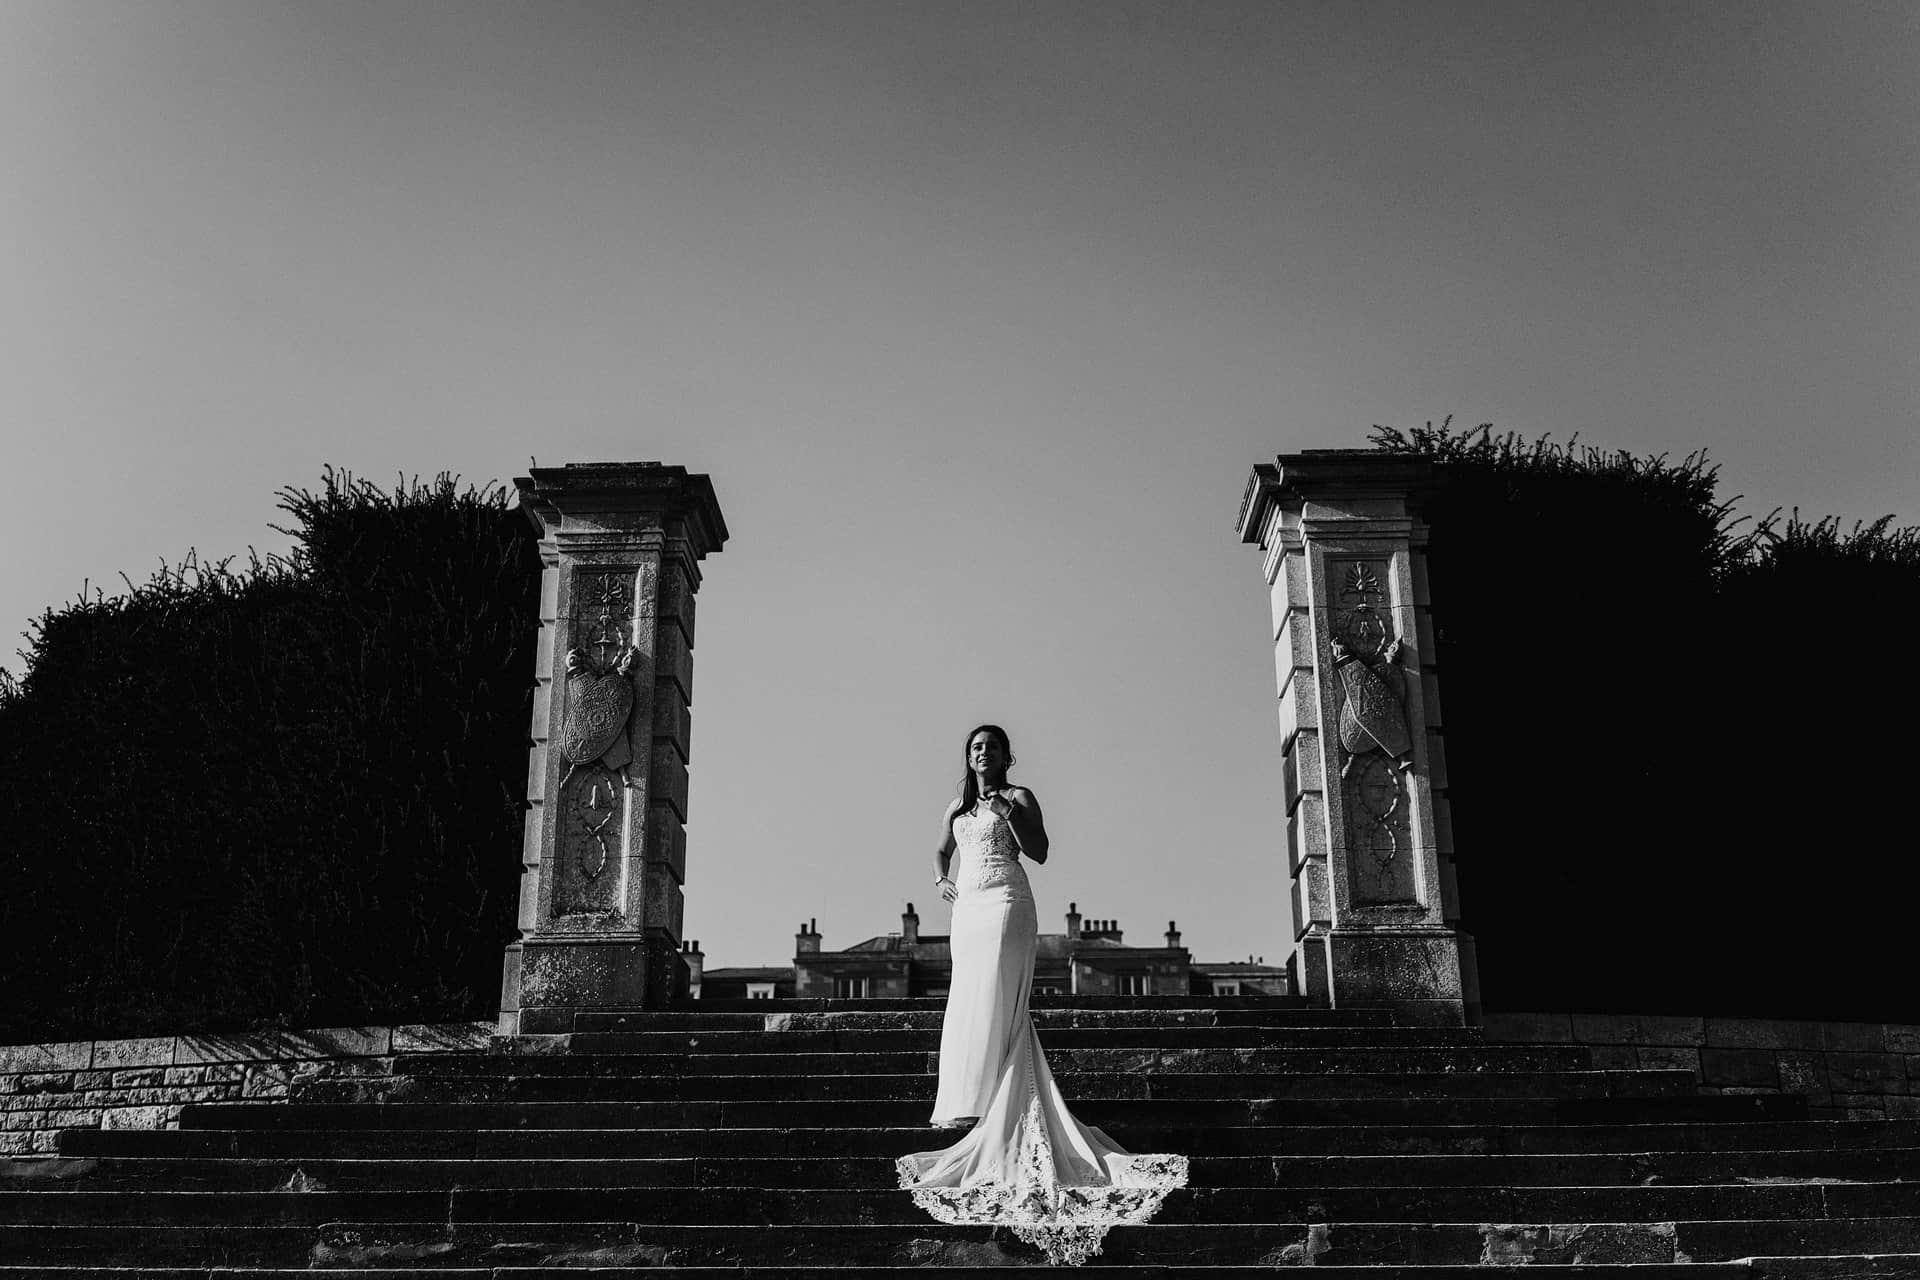 luton hoo summer wedding bedfordshire